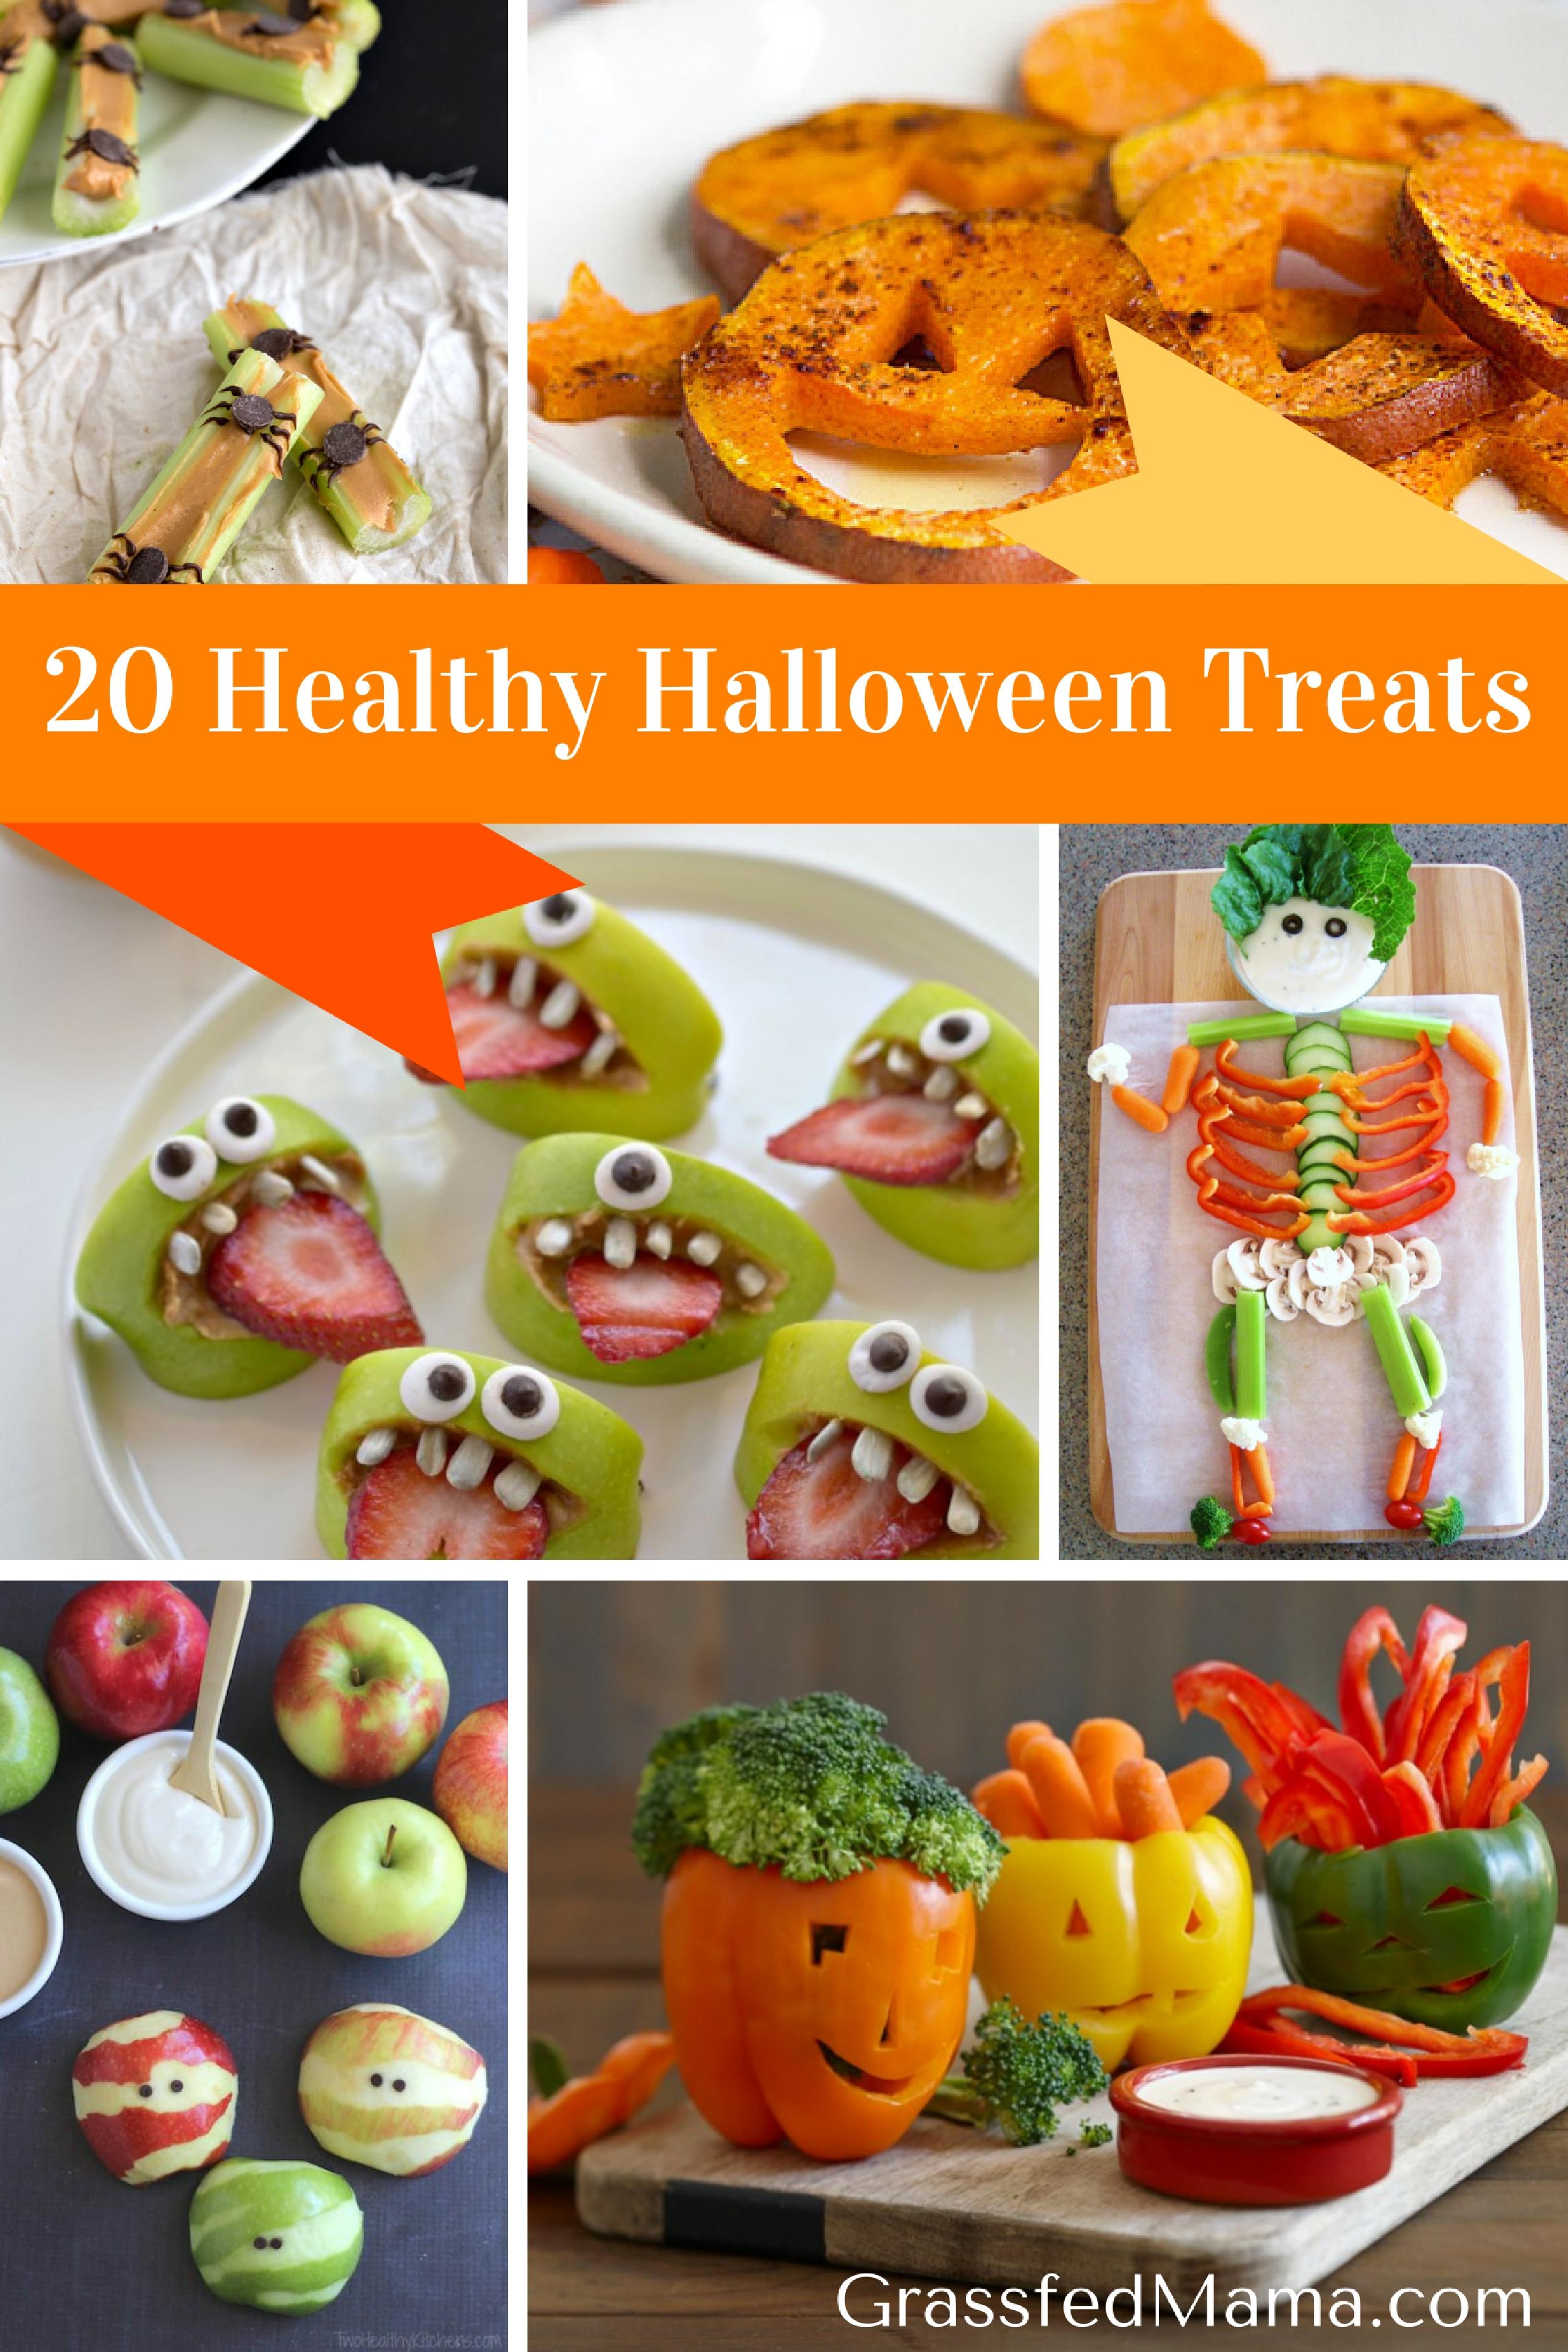 20 Healthy Halloween Treats - Grassfed Mama